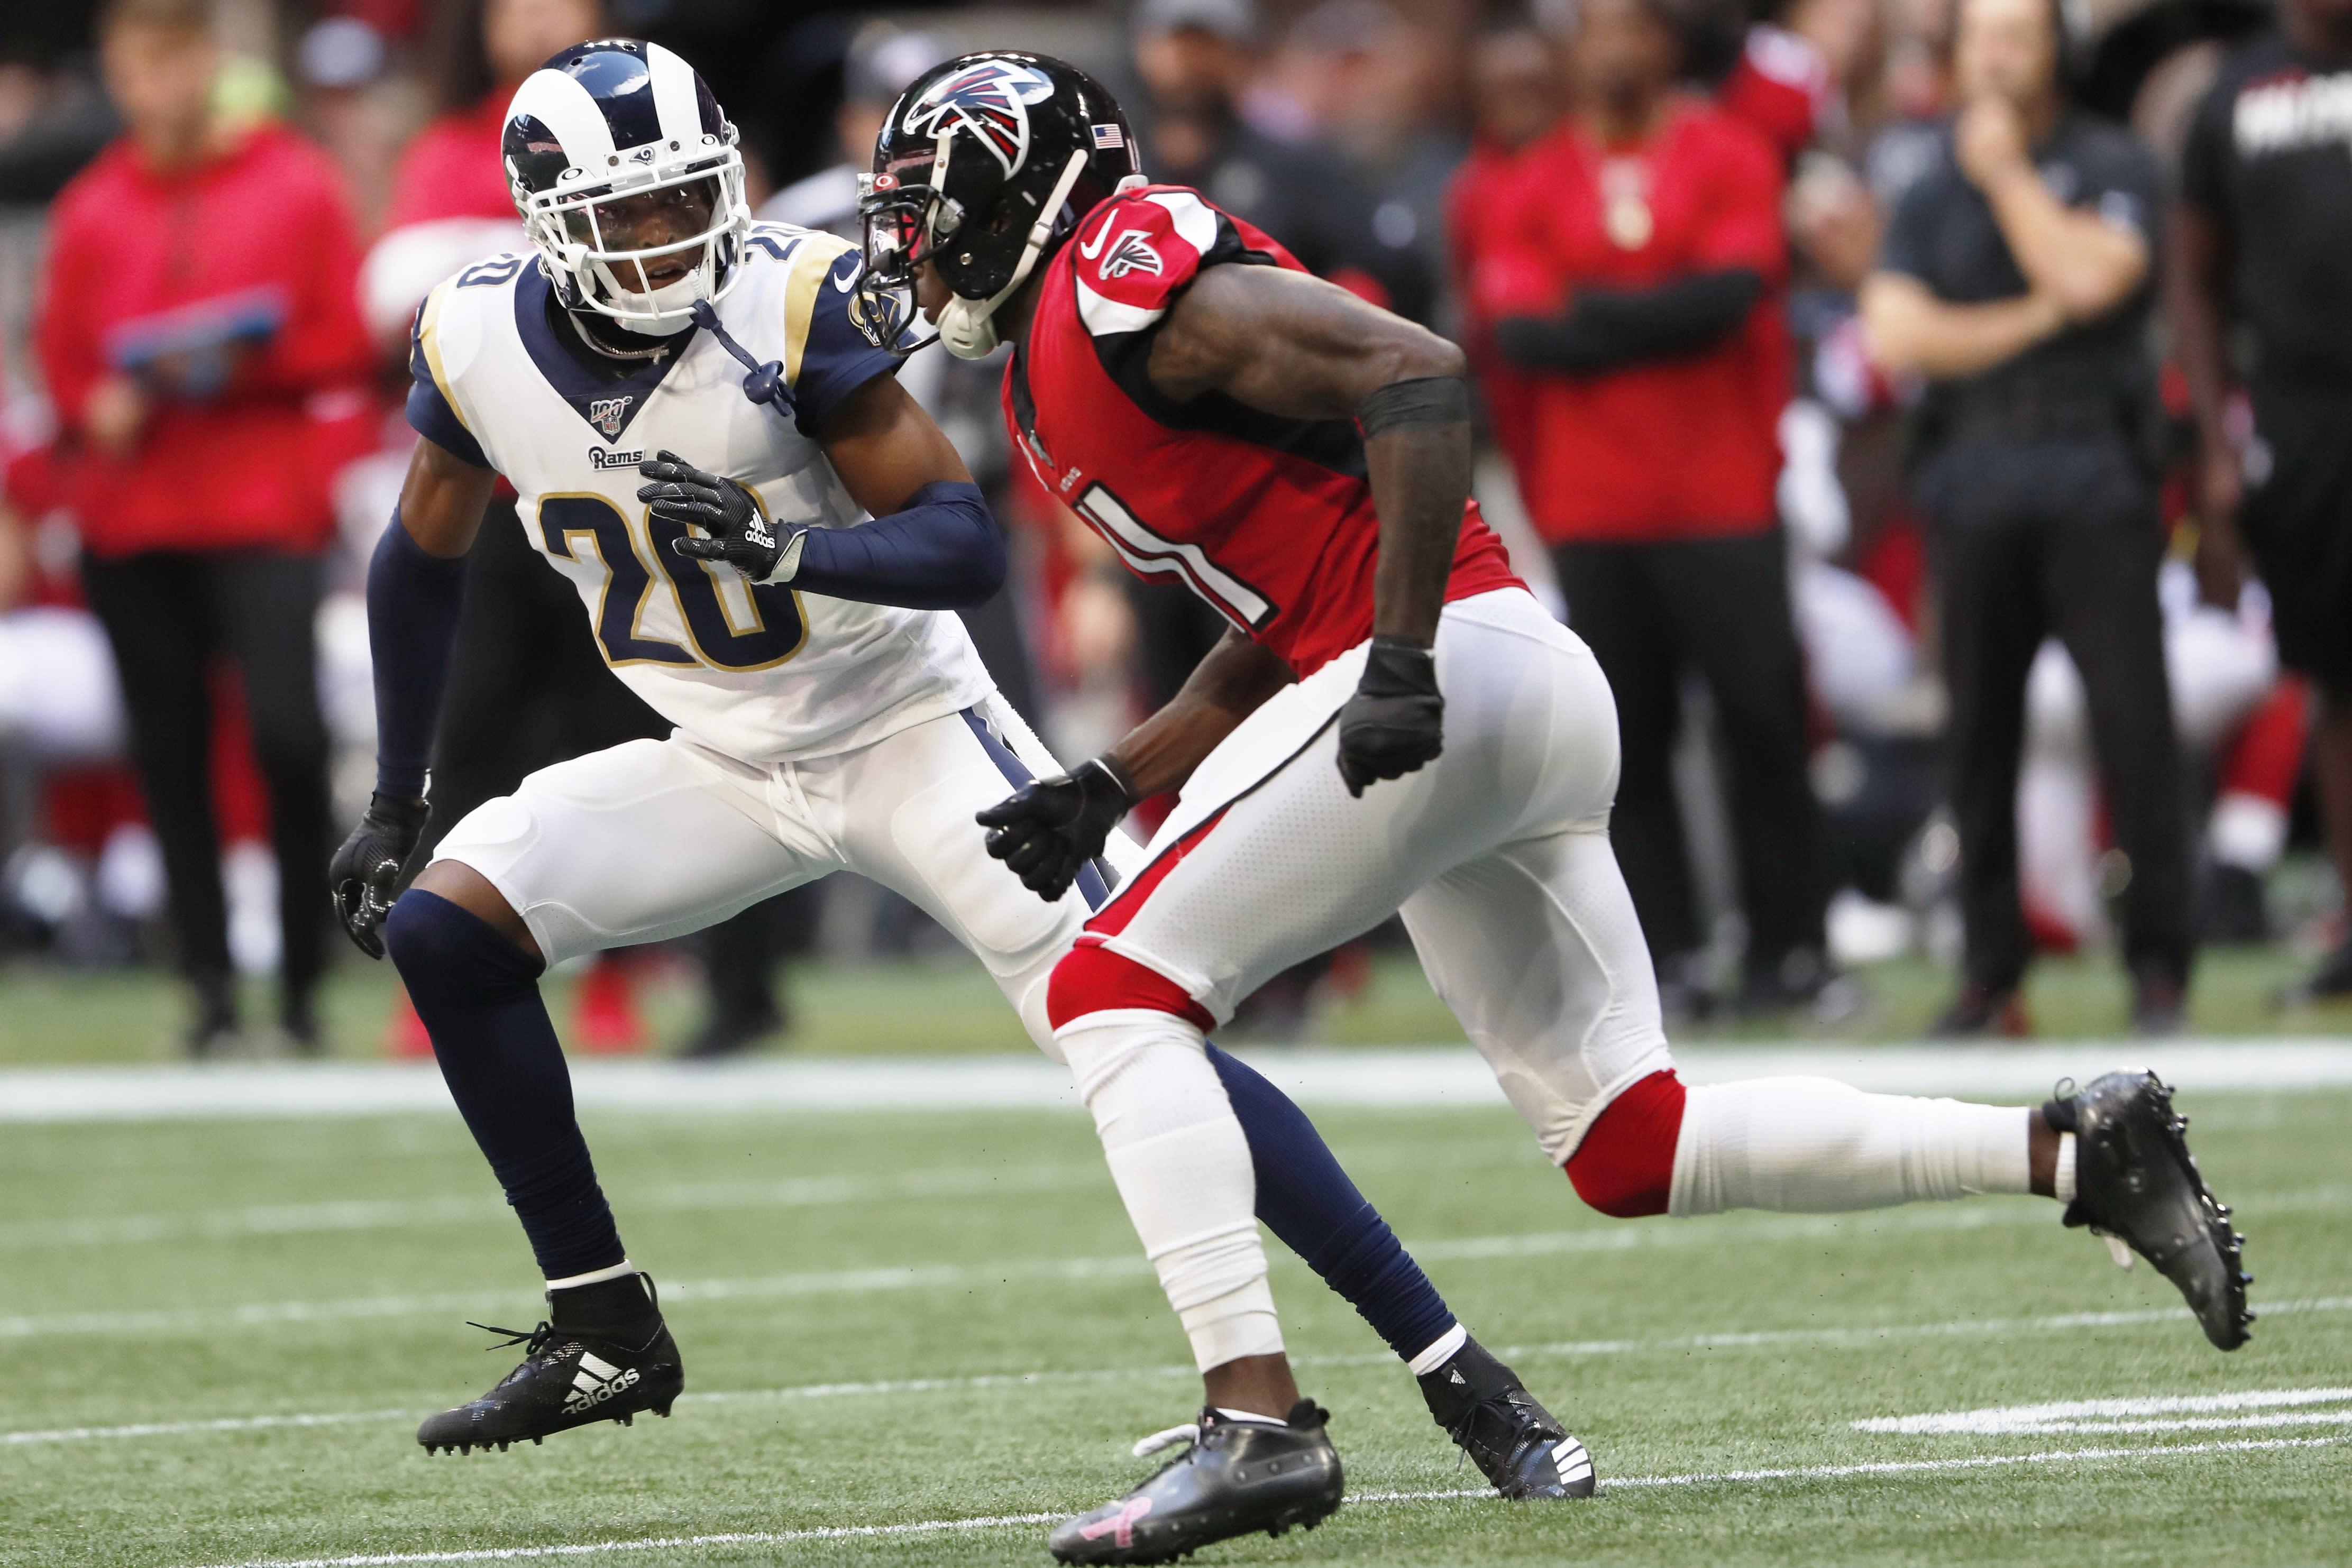 Los Angeles Rams cornerback Jalen Ramsey (20) covers Atlanta Falcons wide receiver Julio Jones (11) during the first half of an NFL football game, Sunday, Oct. 20, 2019, in Atlanta. (AP Photo/John Bazemore)